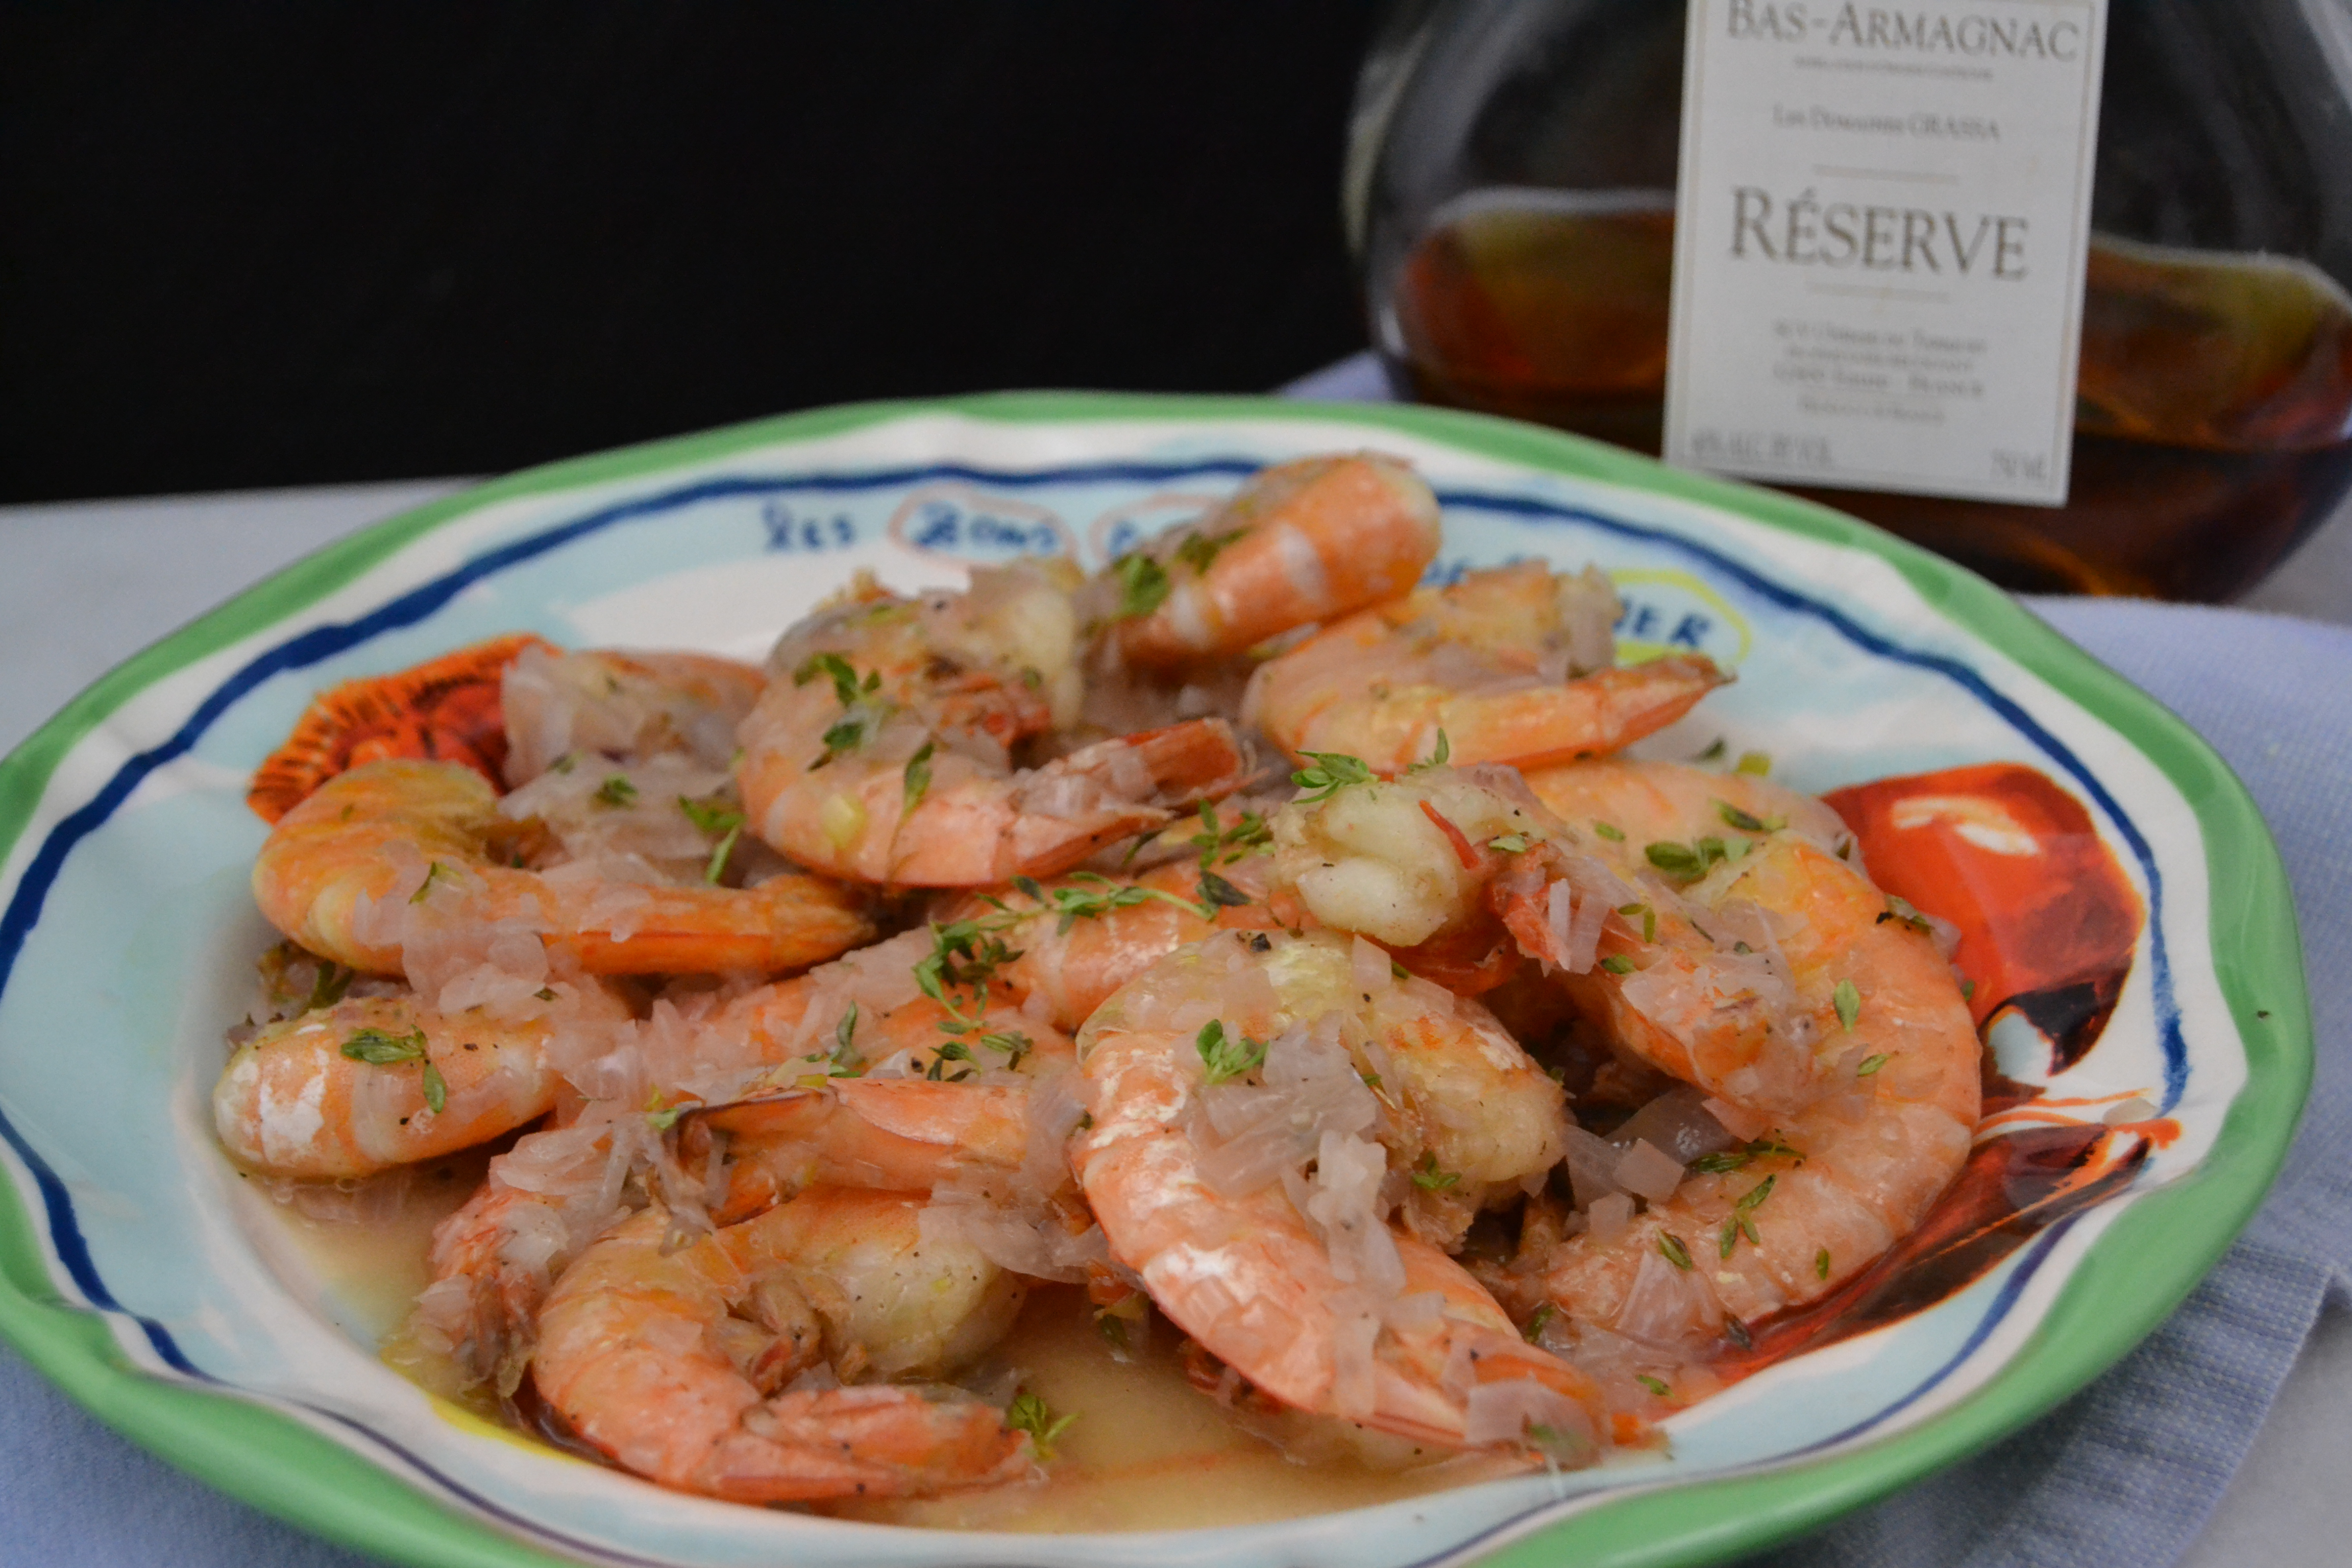 Shrimp with Armagnac